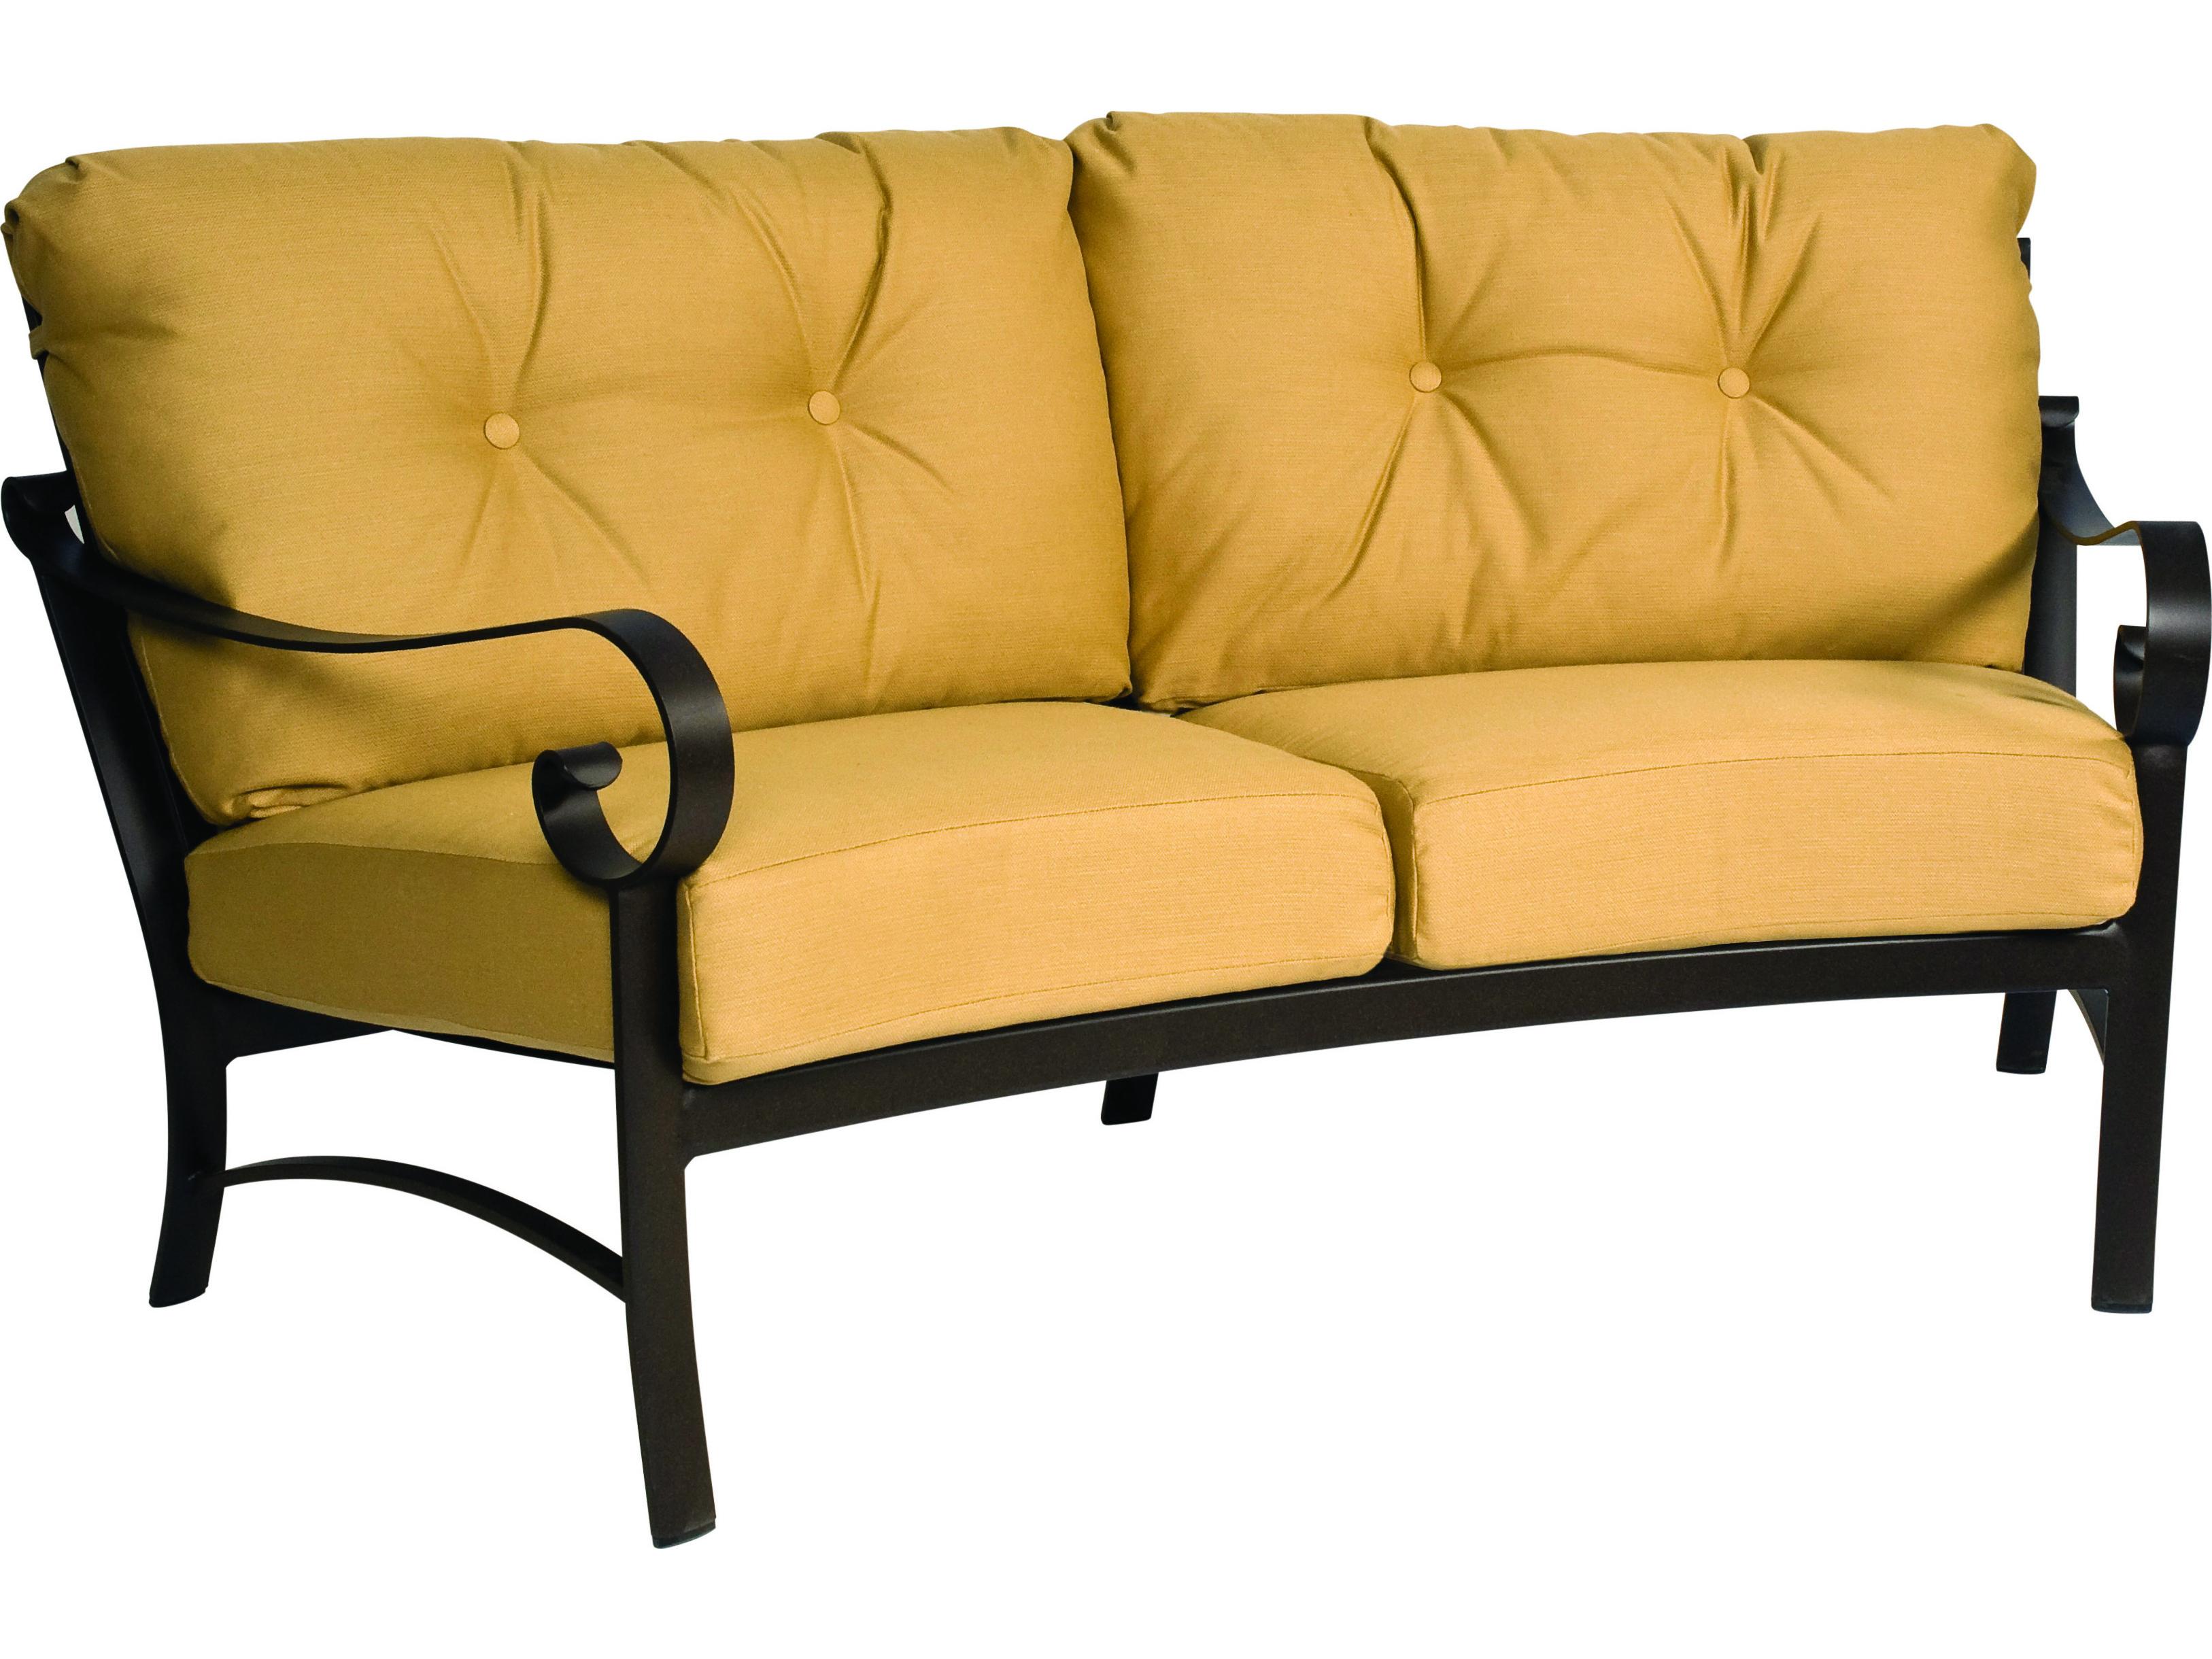 lane mesmerizing furniture cushion outdoor sets furnitur indoor depot swivel wicker for birch patio home chair loveseat rosemead cheap with ideas sunbrella glider or